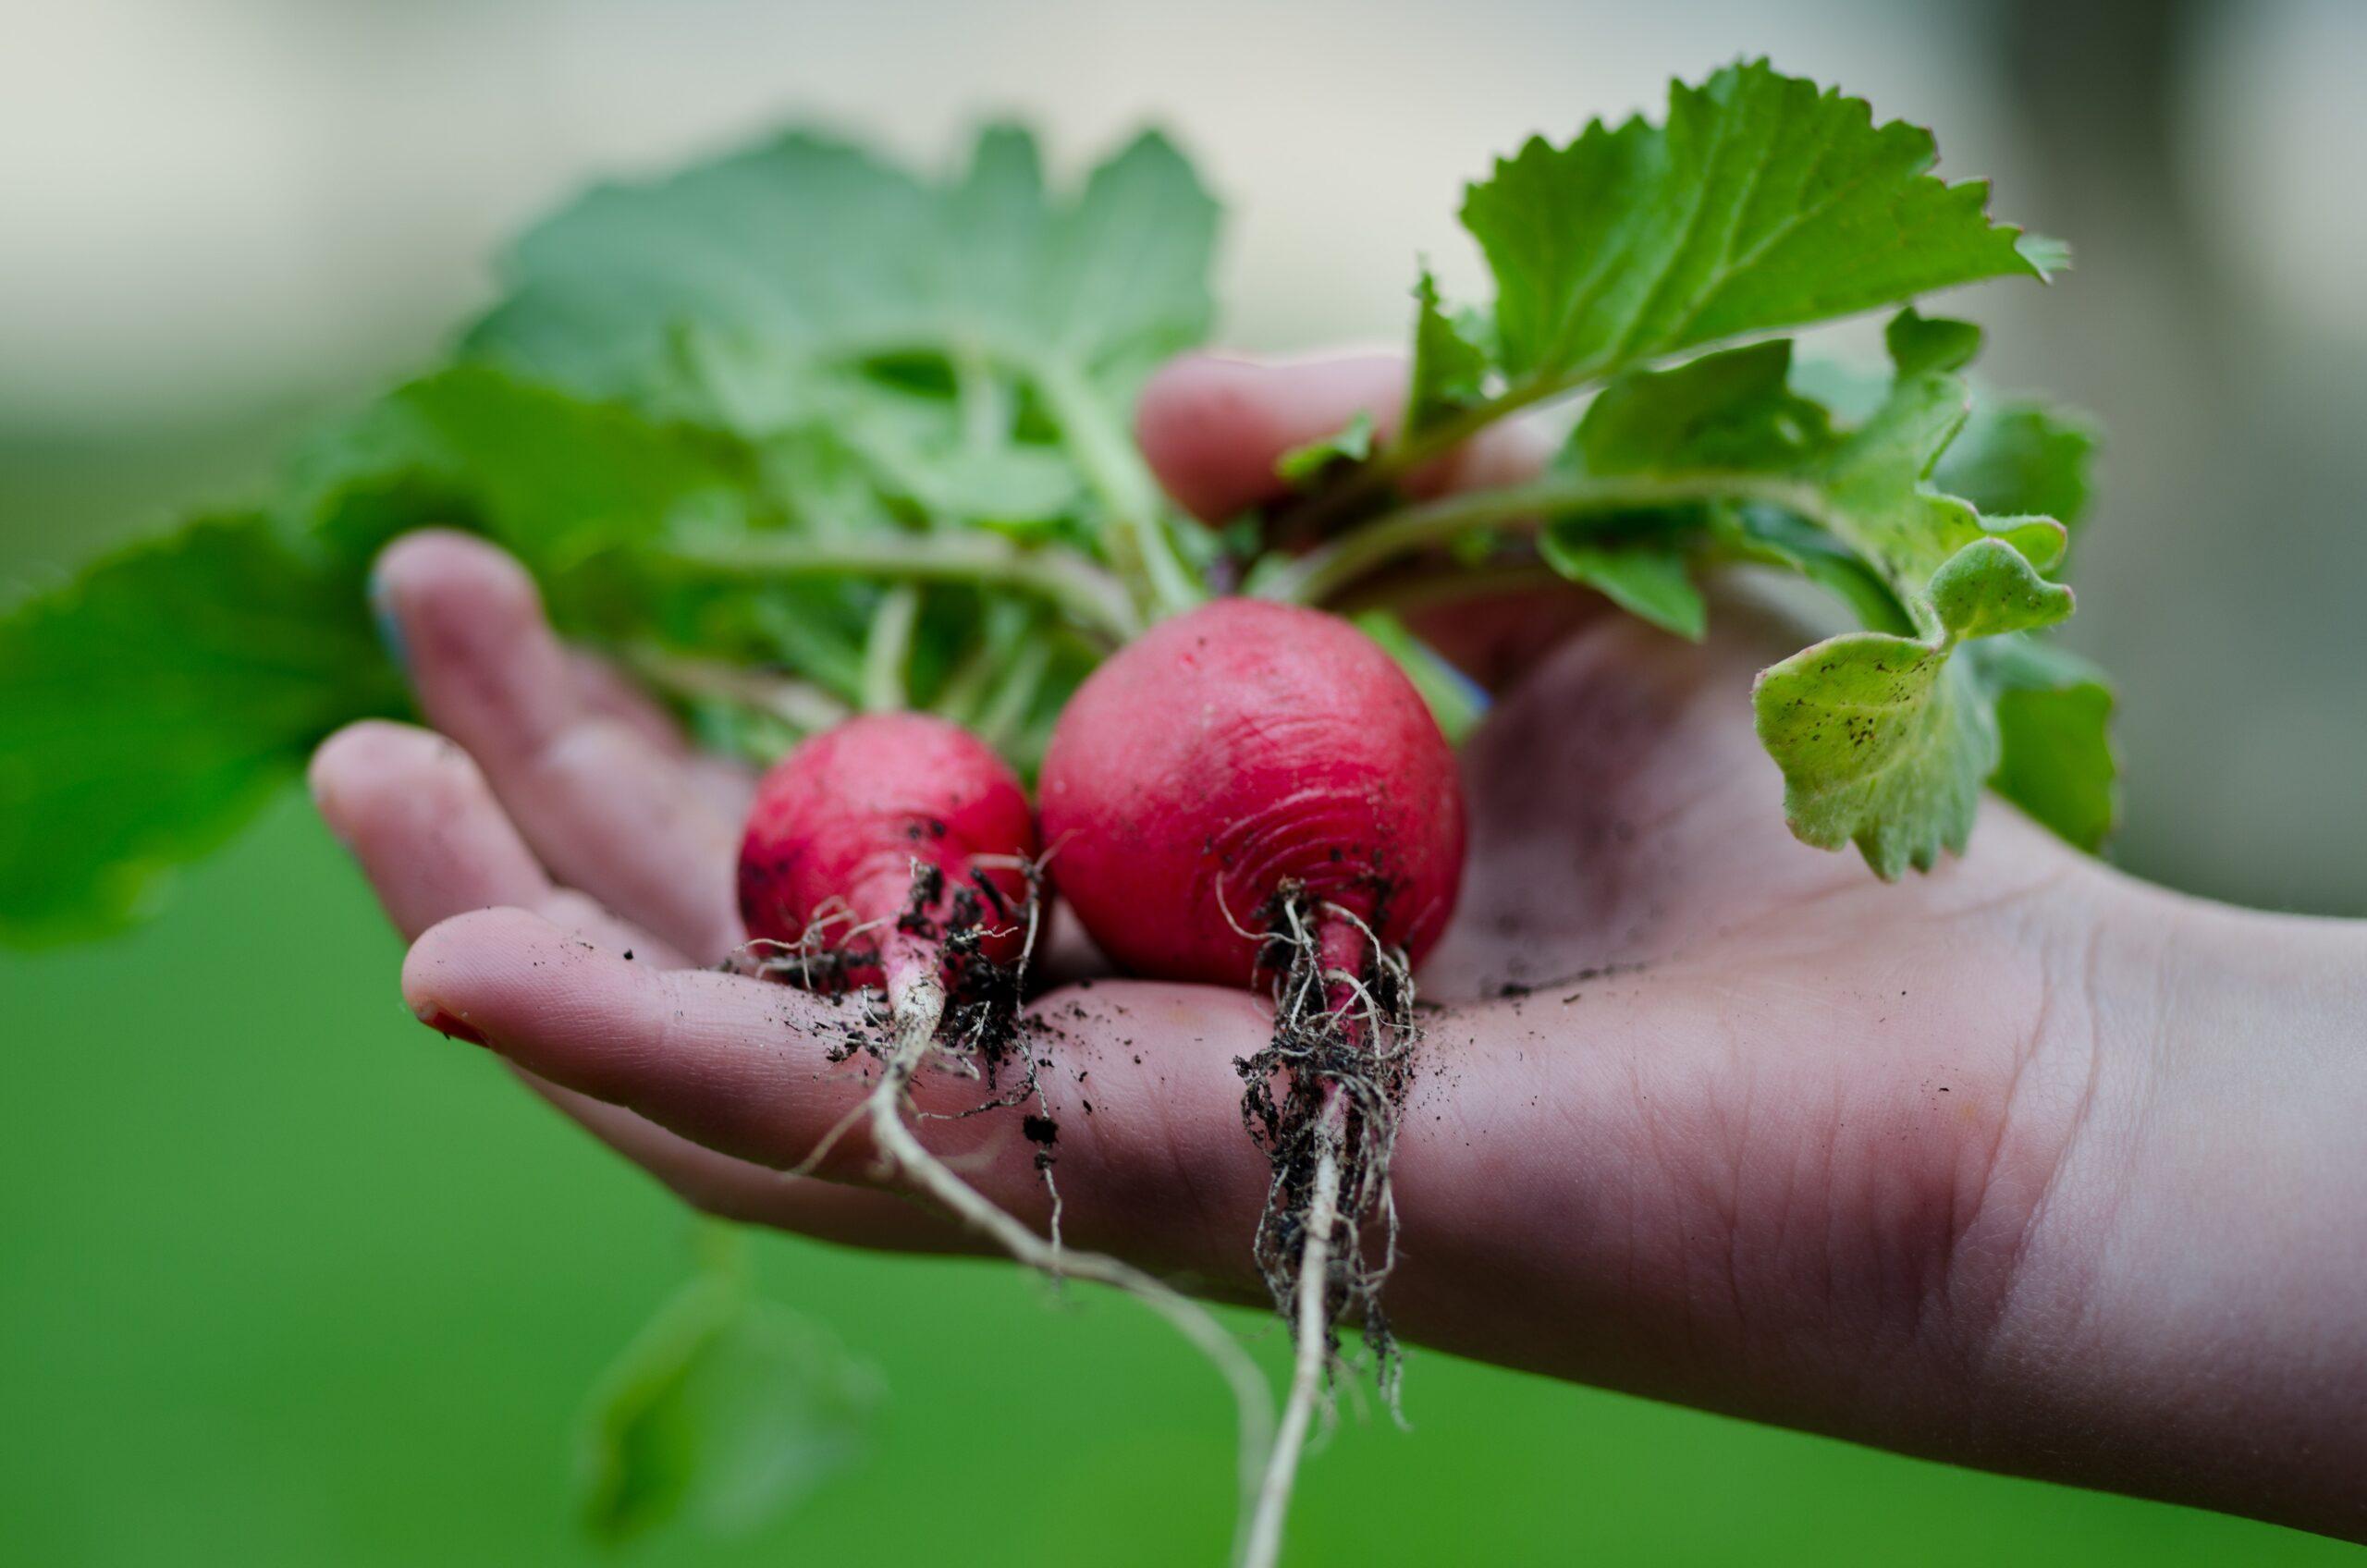 healthy-vegetables-hand-gardening-9301